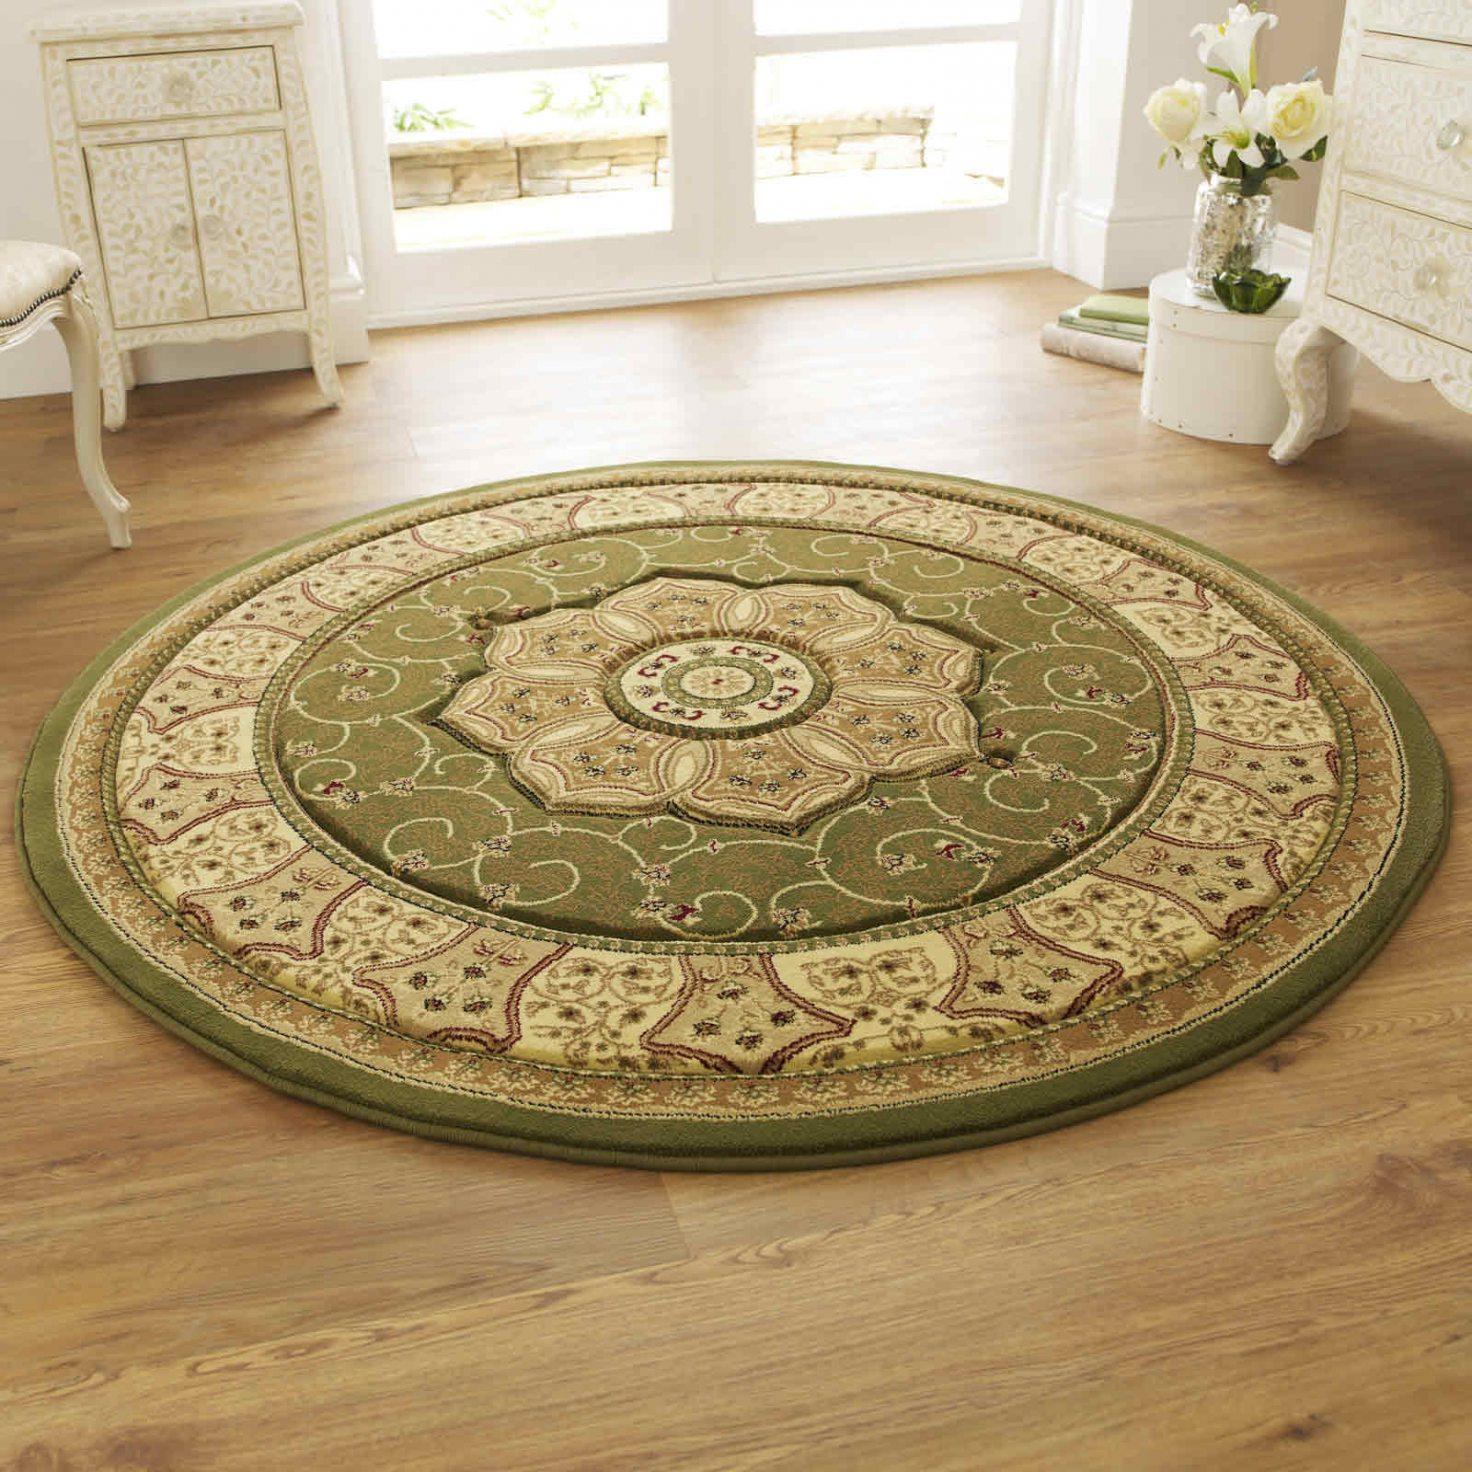 Photo 1 of 5 green round round braided carpets (extraordinary round carpets PXRZDCC